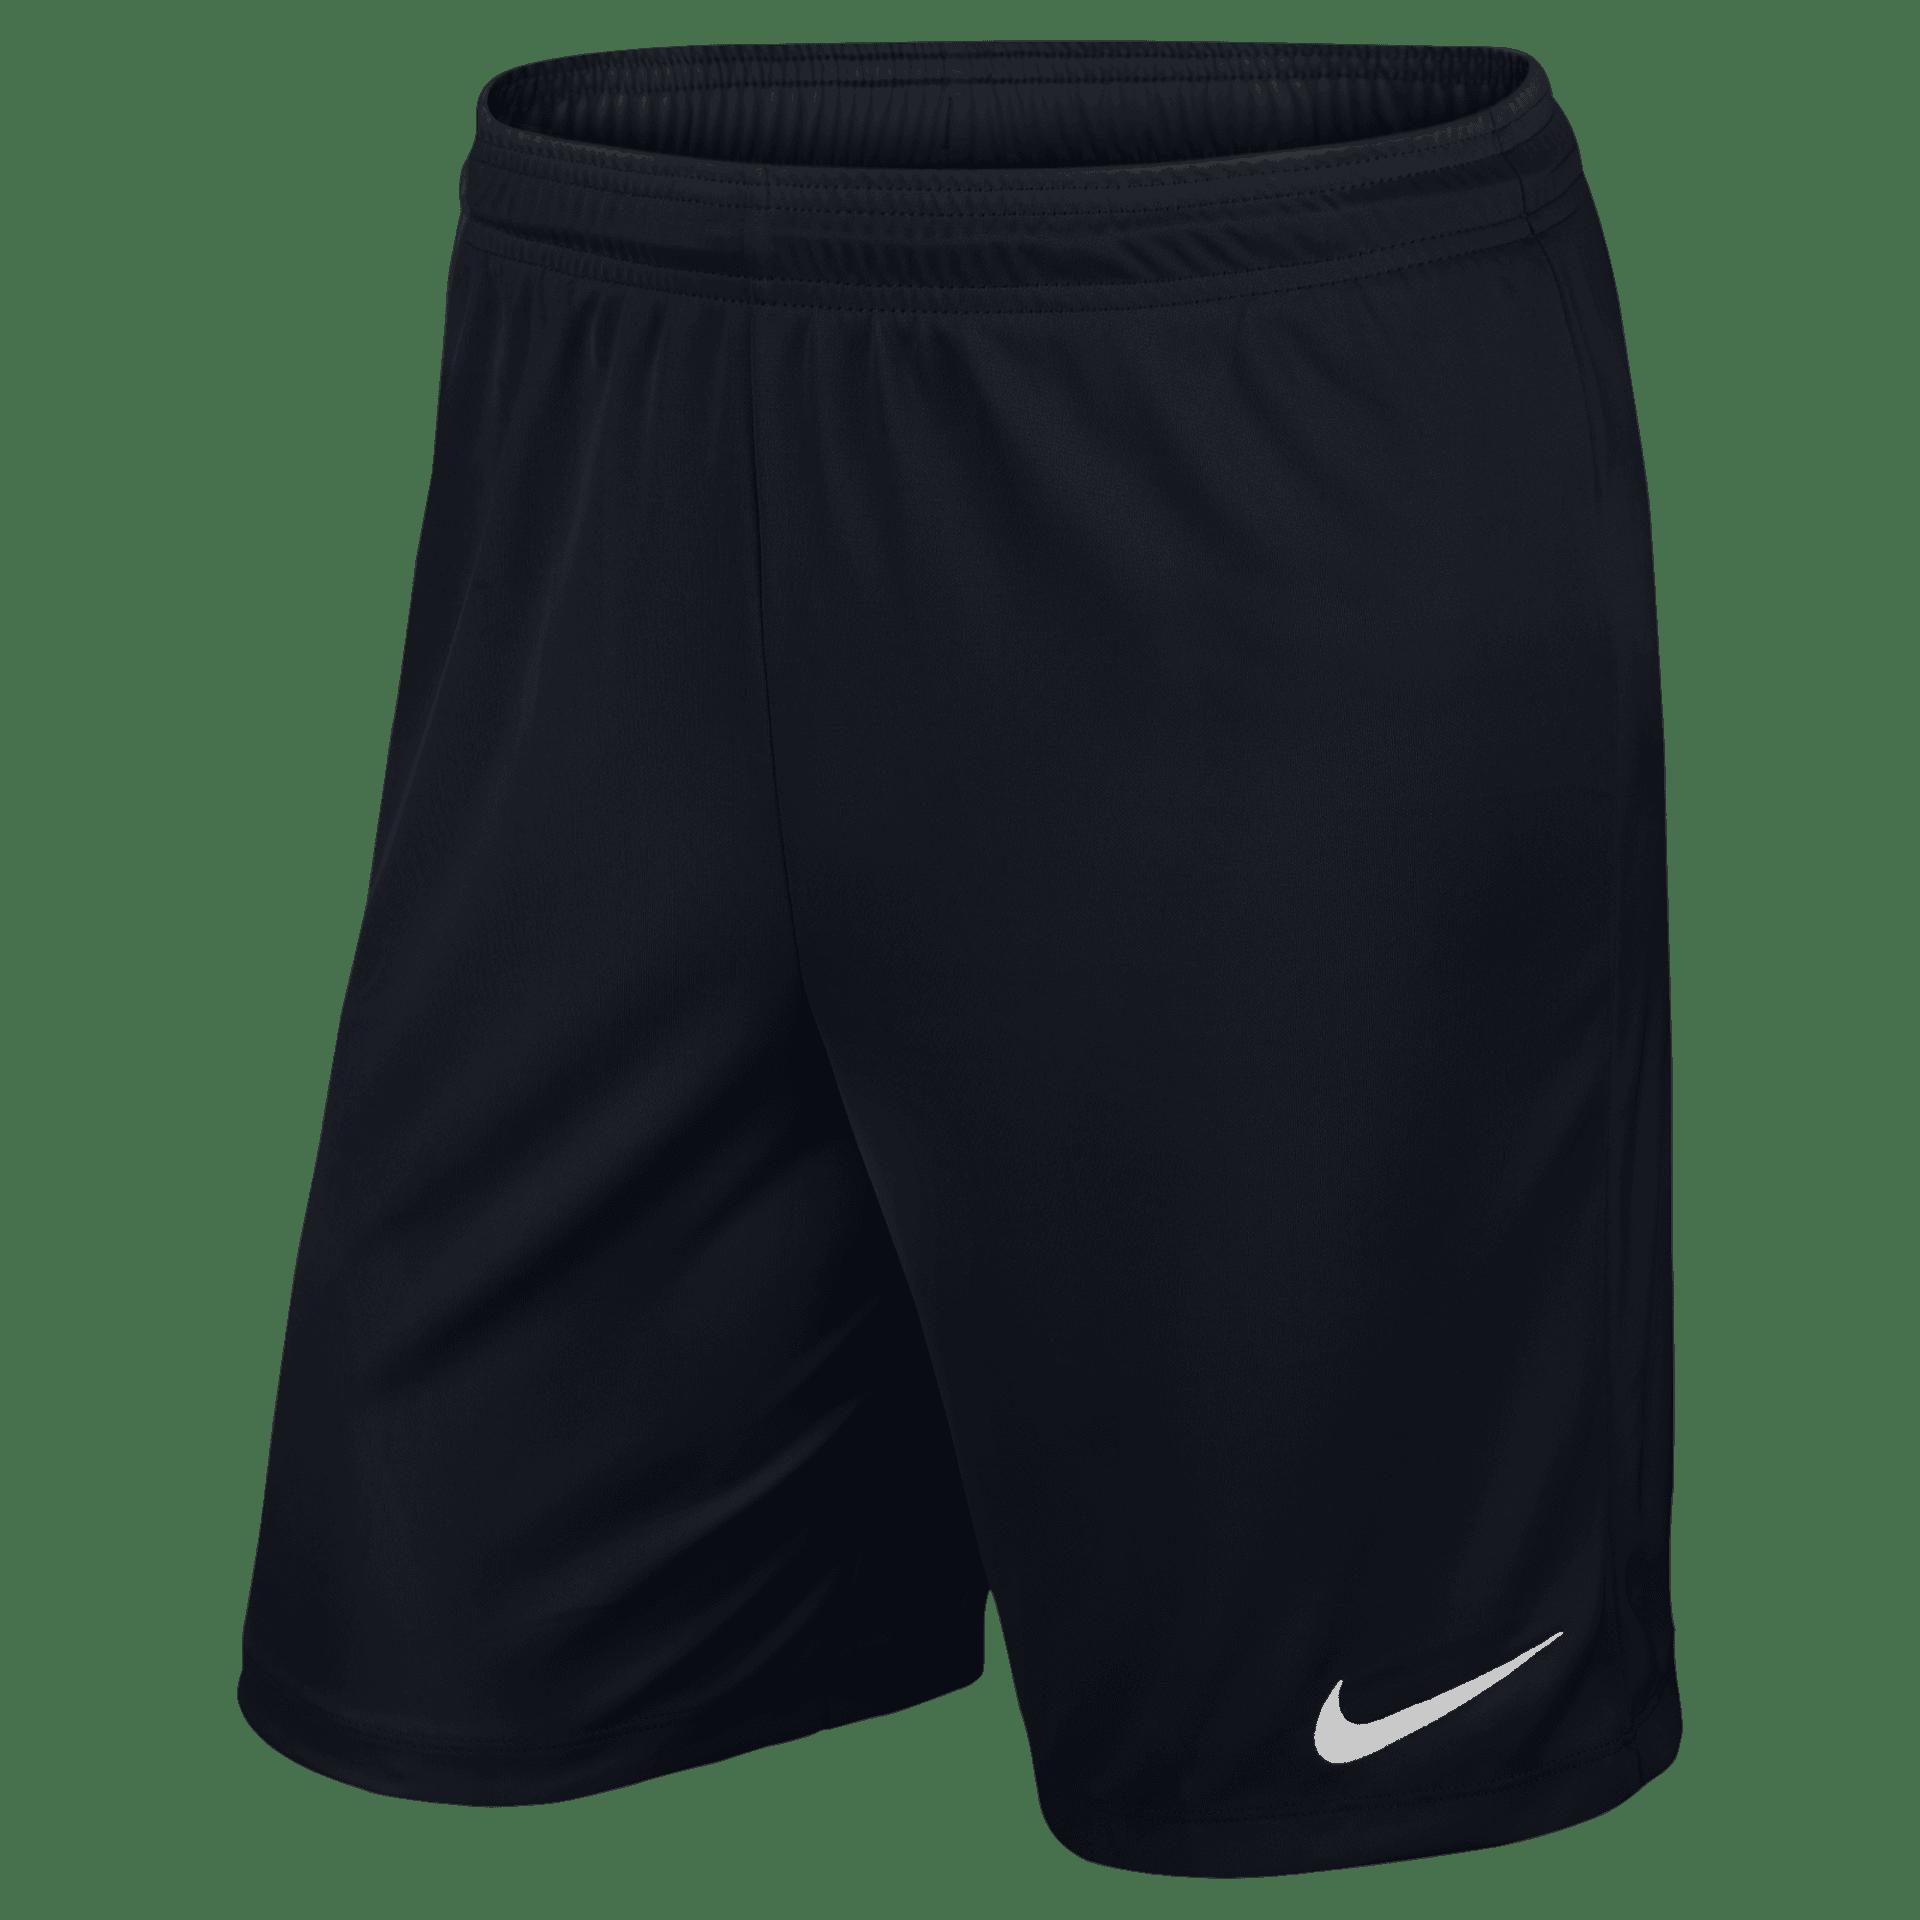 westland fc shorts size xxl mens 34970 p